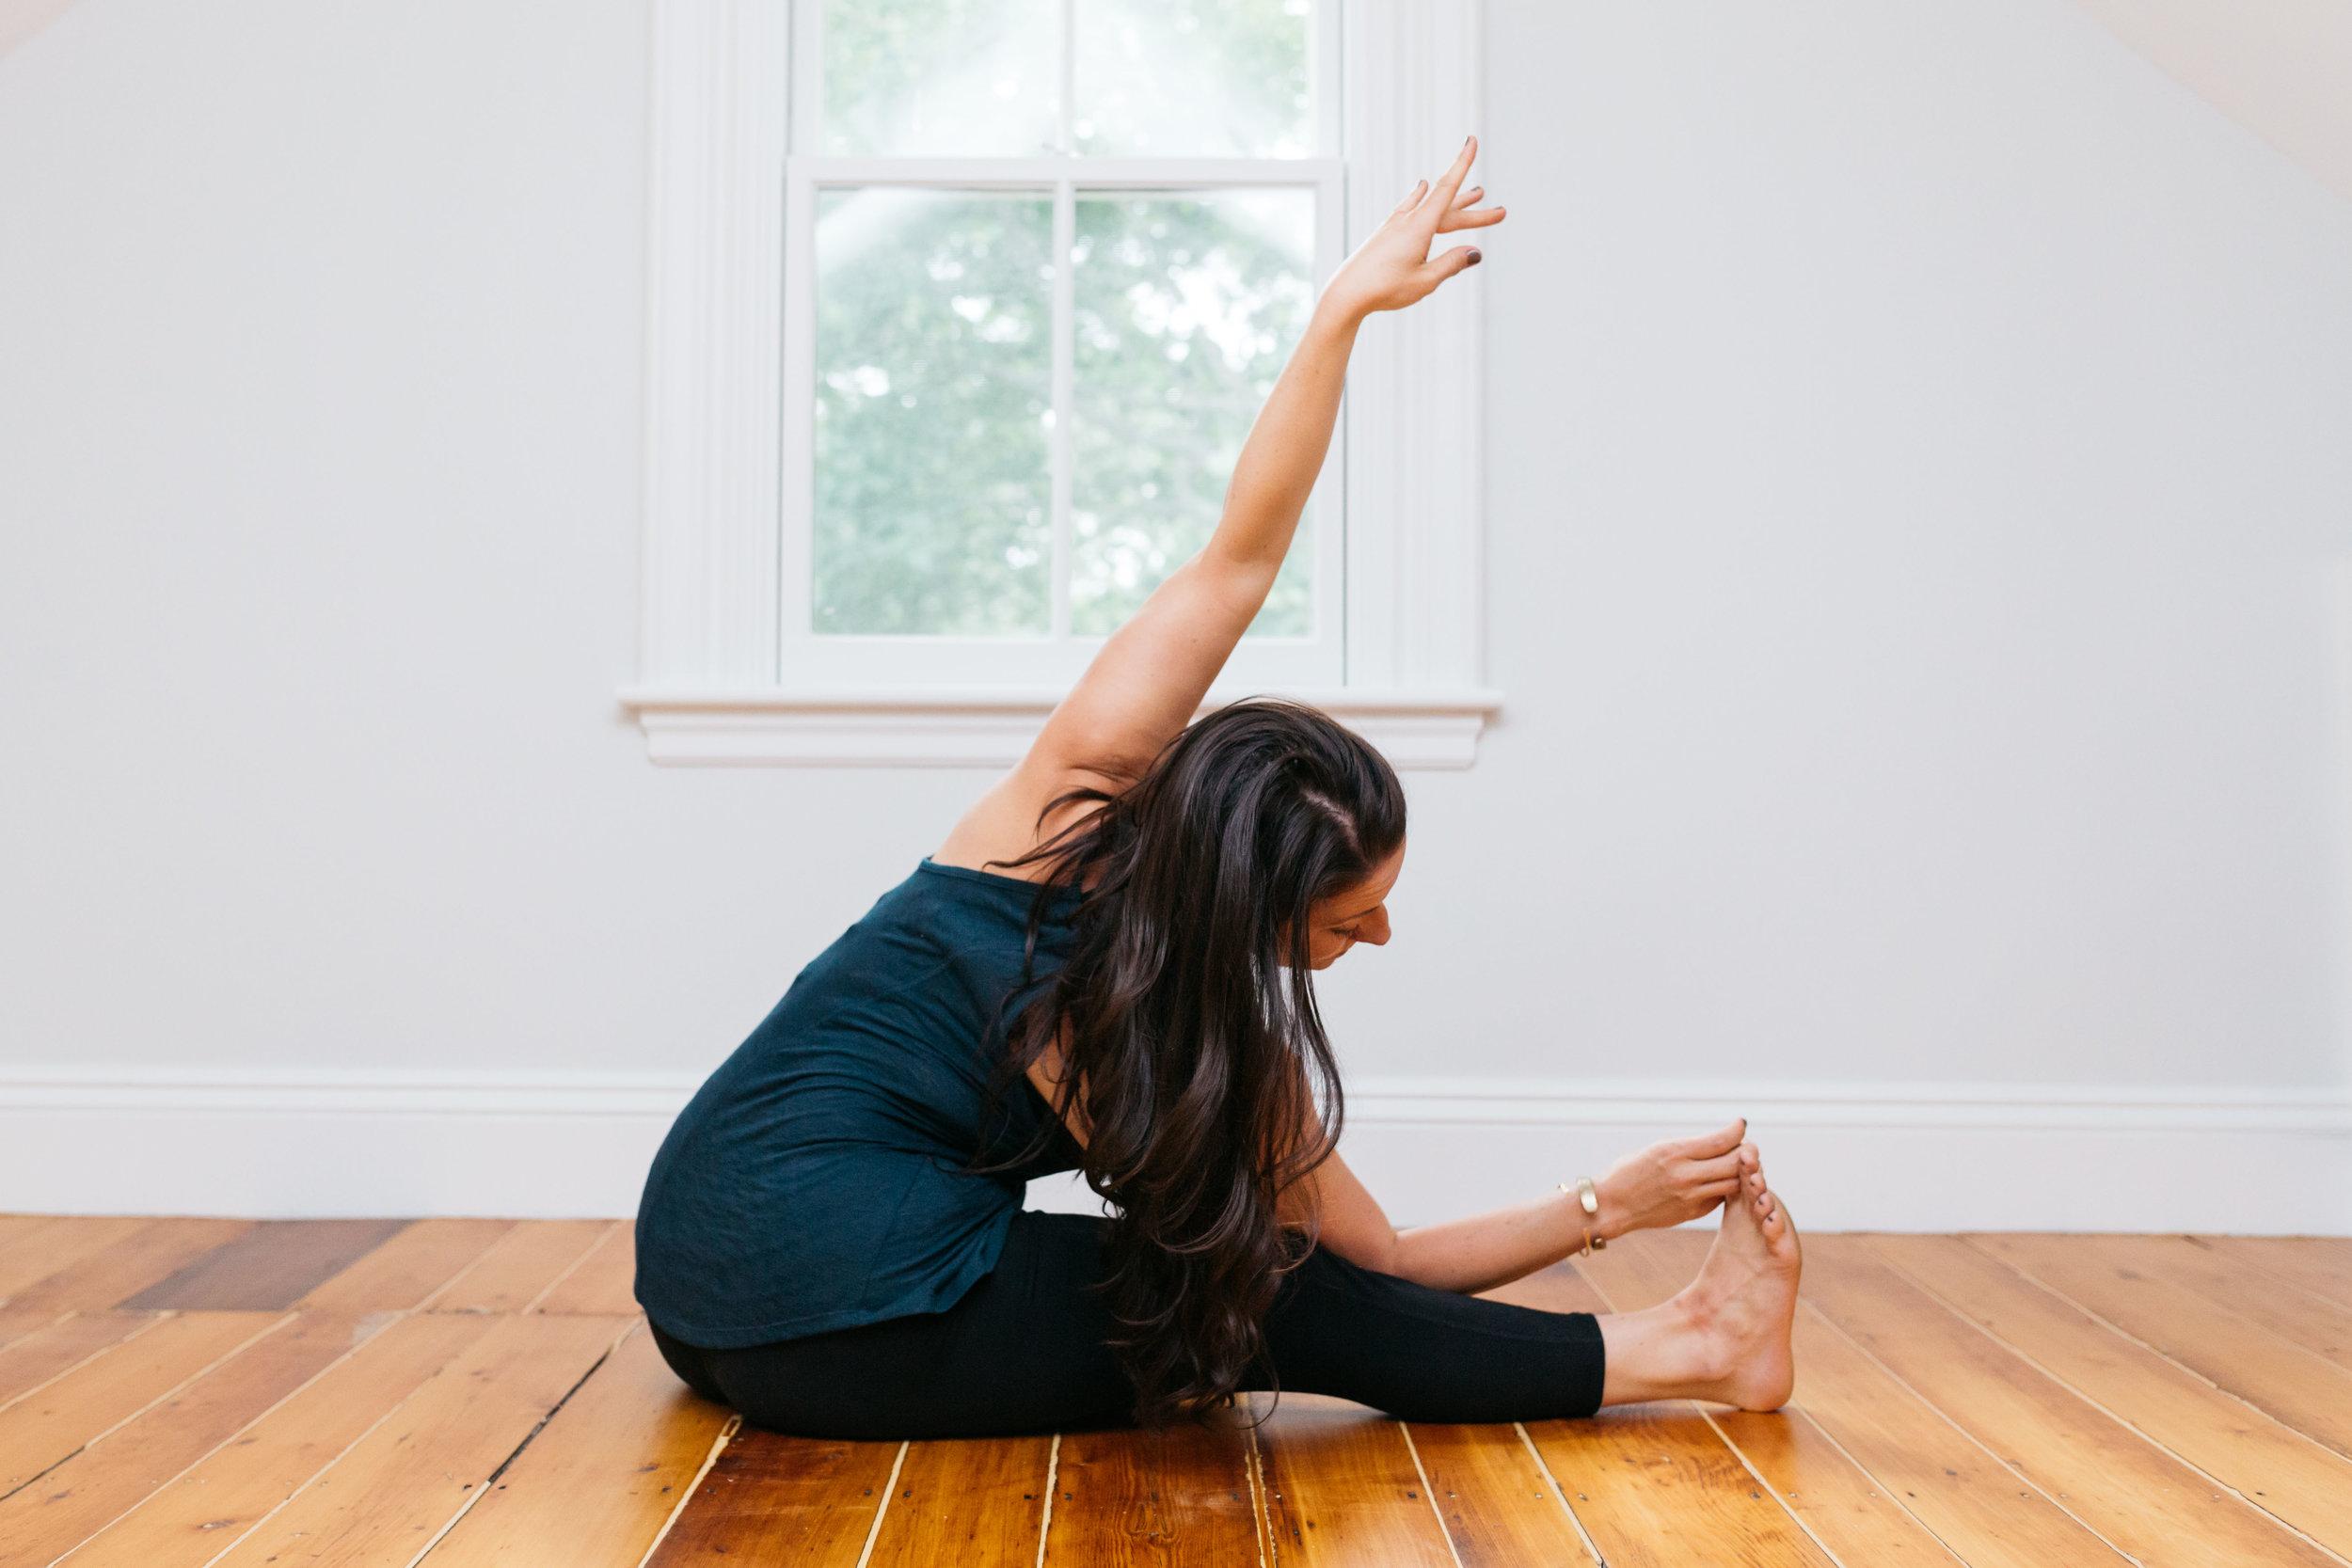 boston-yoga-photographer-christyn-12.jpg